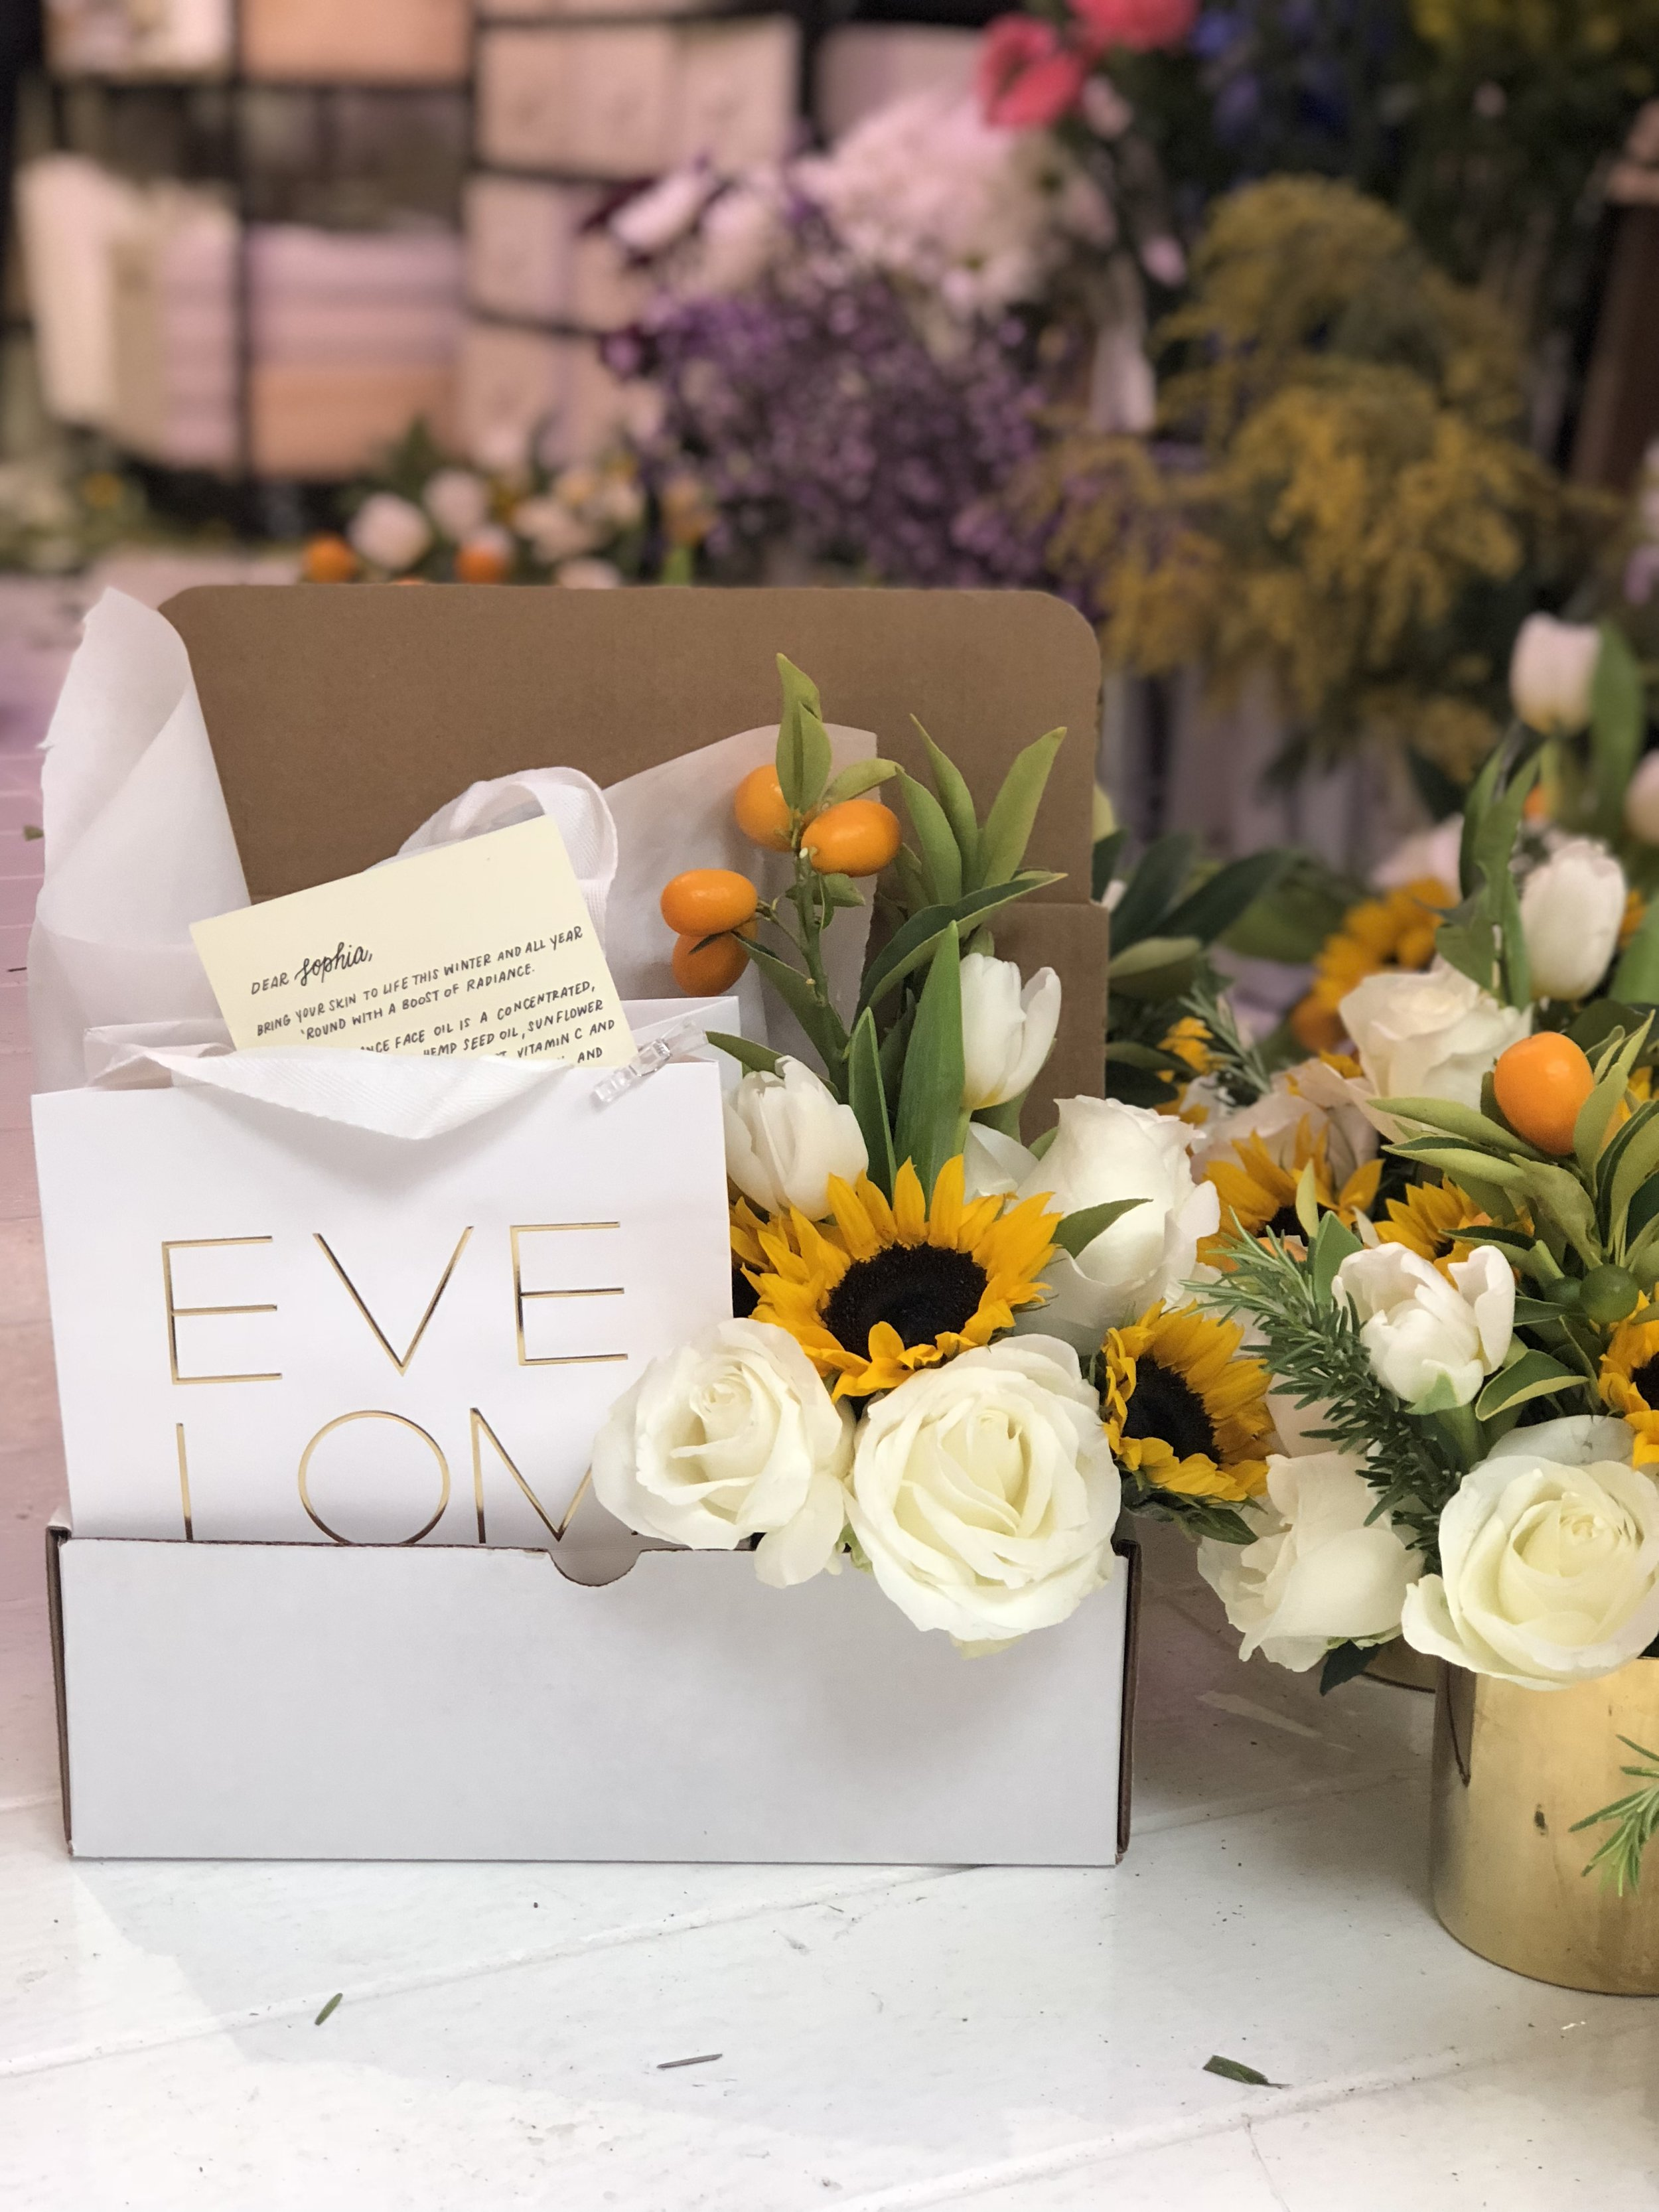 Eve Lom Gifting